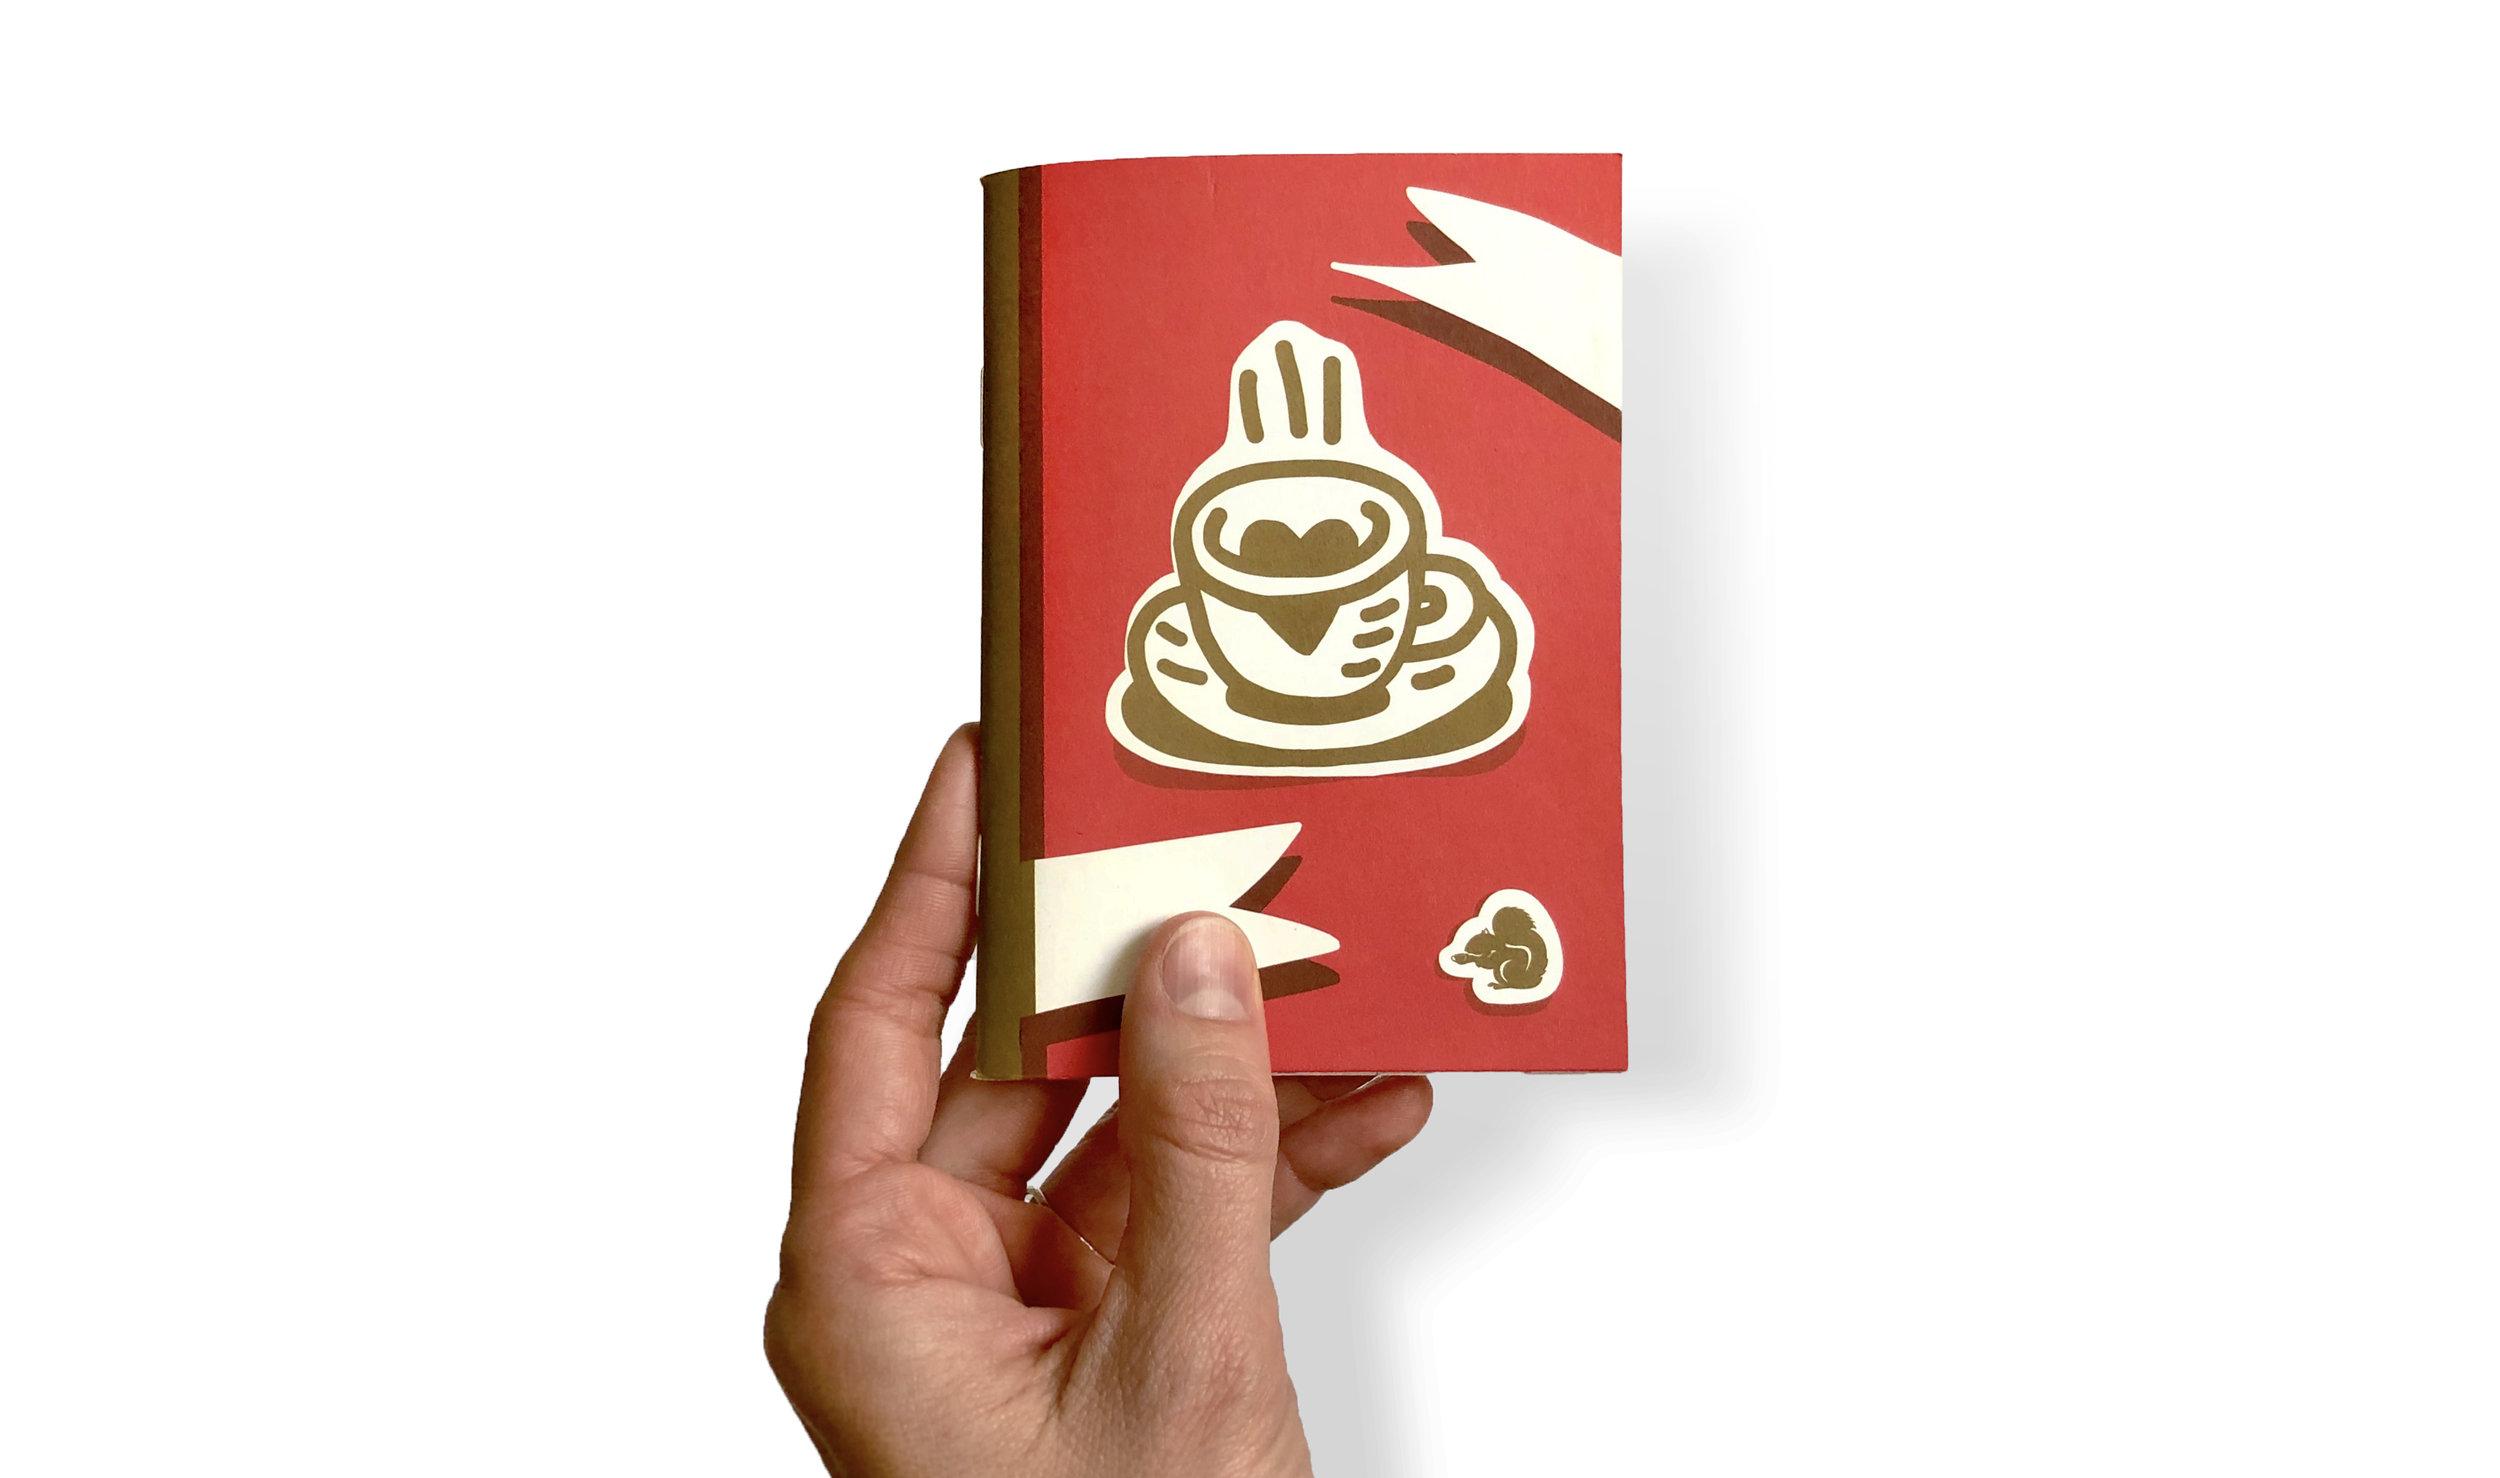 ss_recipebook_hand-1.jpg